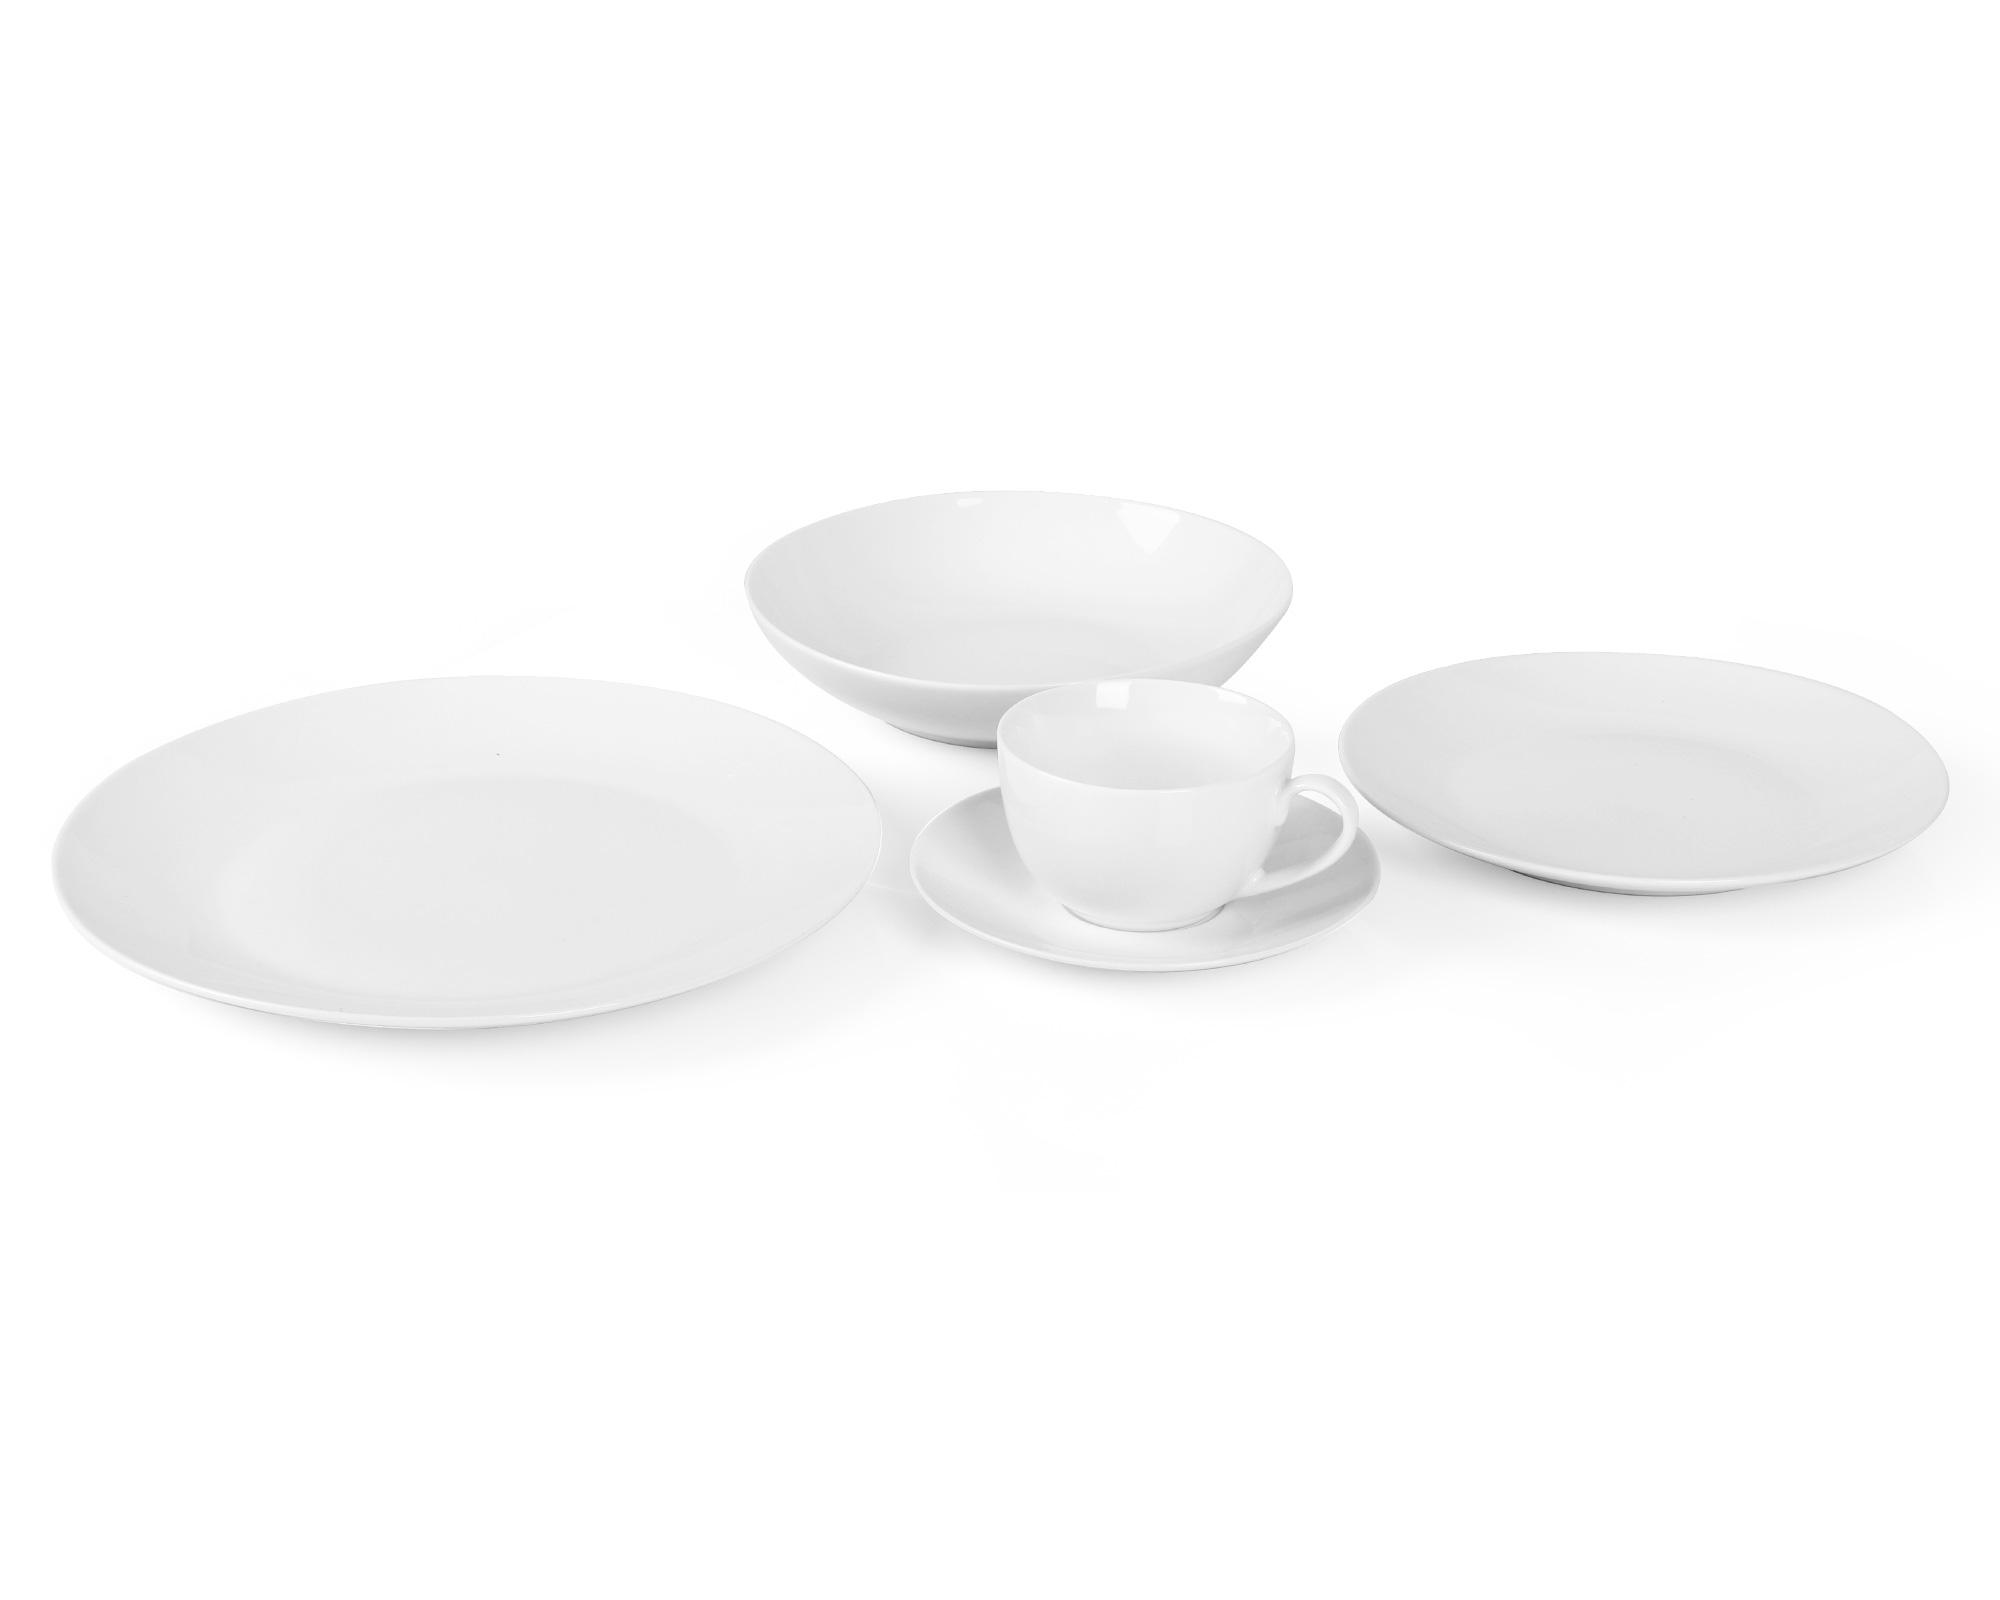 Coupe shape new bone china dinnerware set